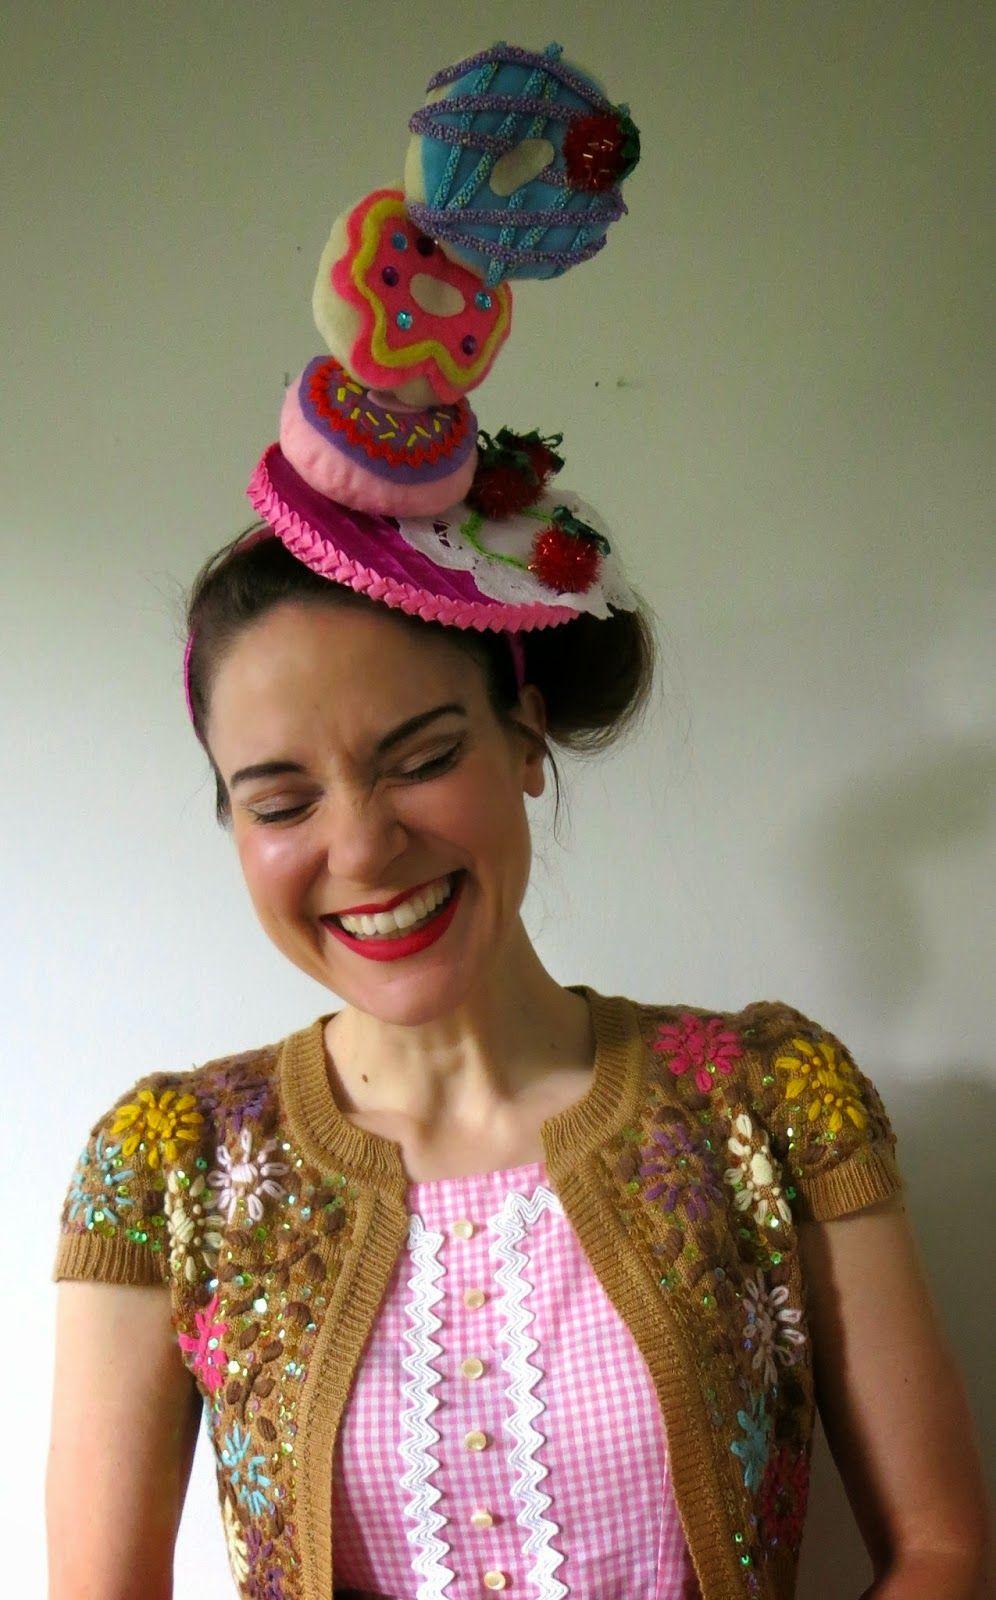 wayne thiebald hat making diy Crazy hat day, Donut hat